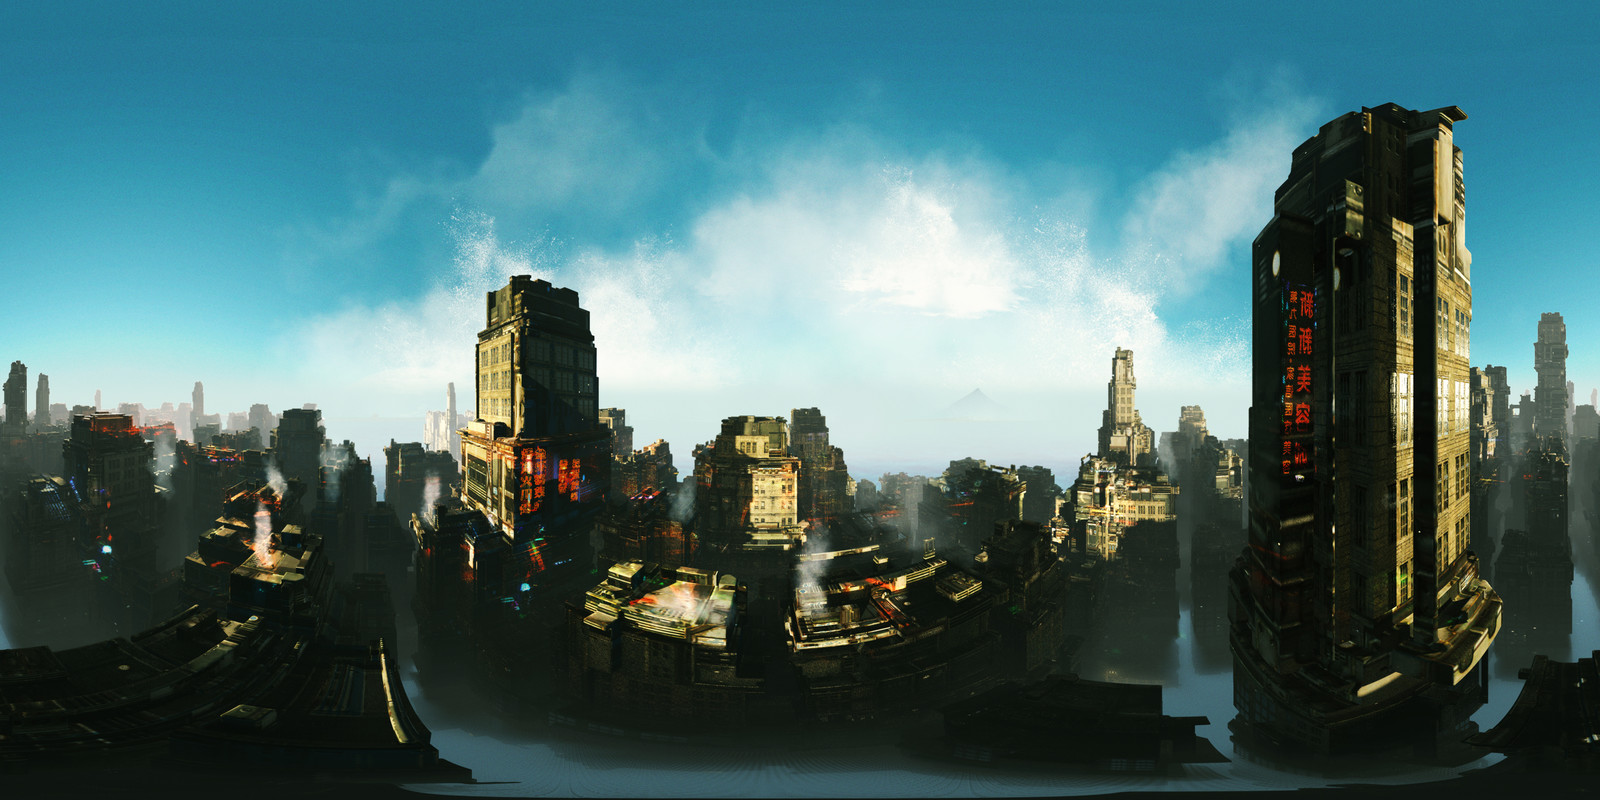 Sci Fi City - Keyshot panoramic lens test